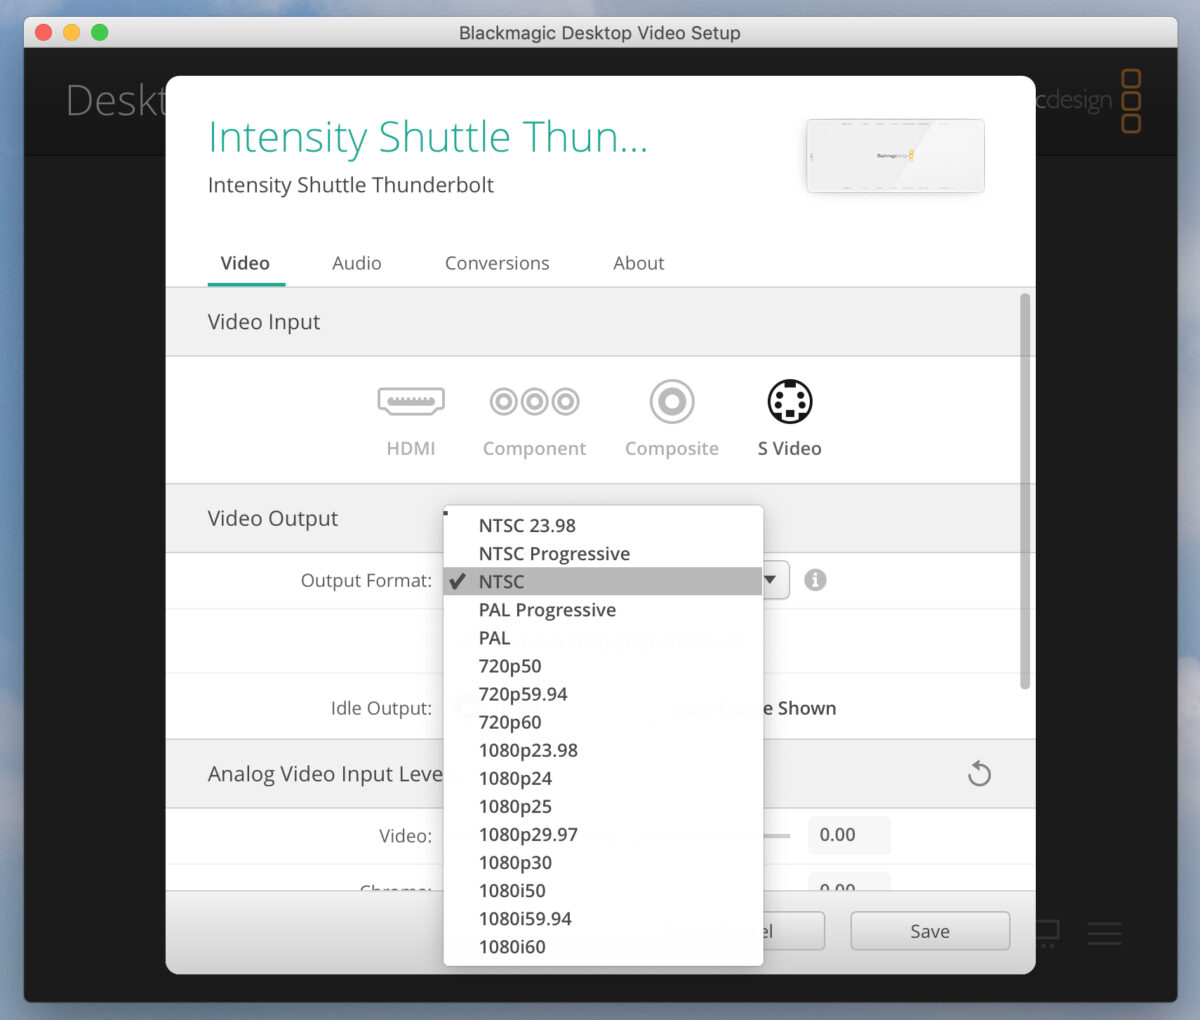 BlackMagic Desktop Video Settings